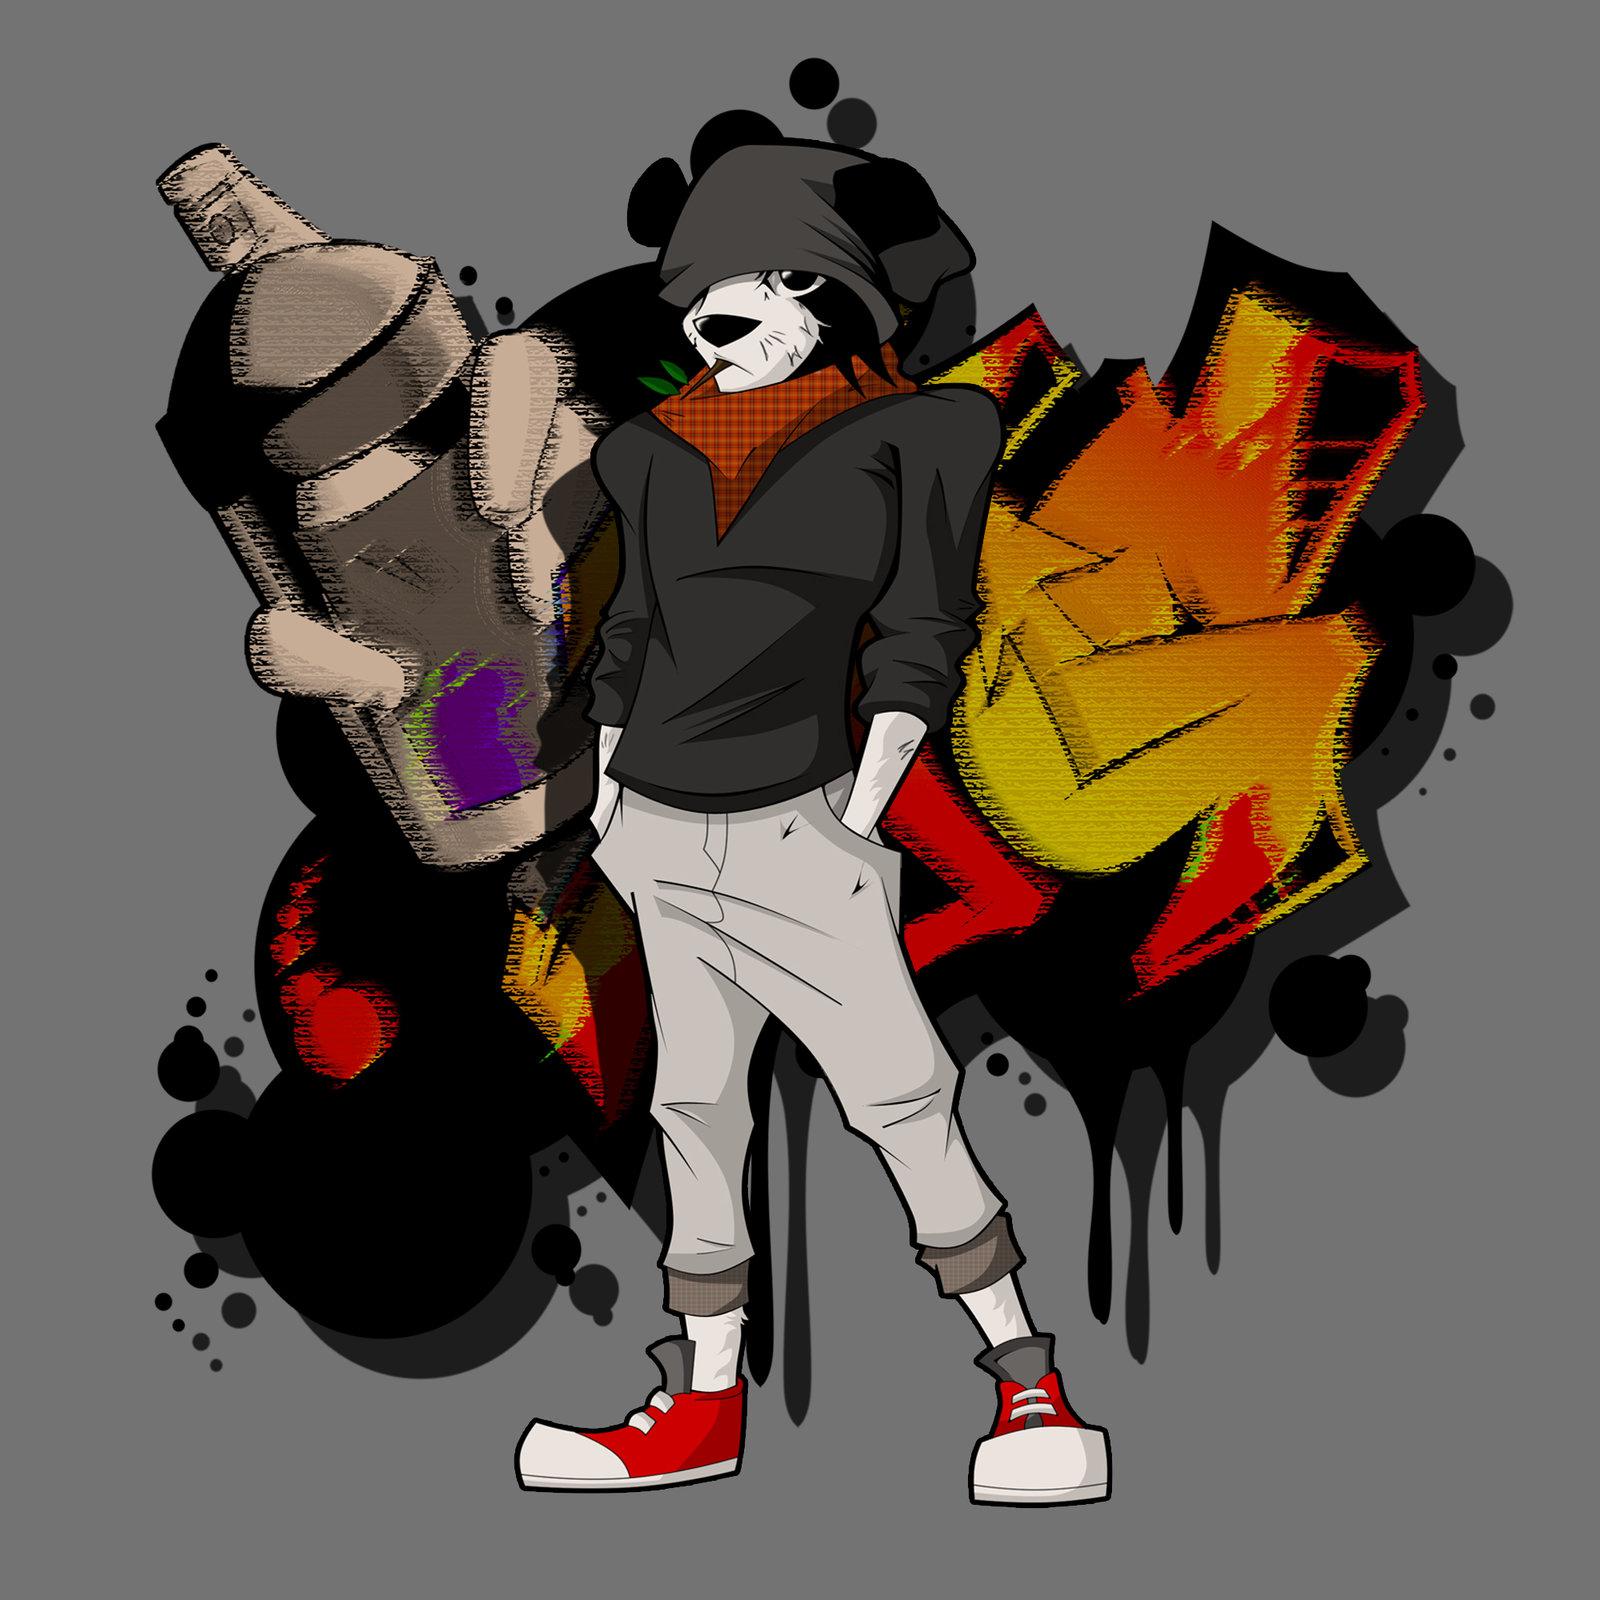 Same panda, different clothes.